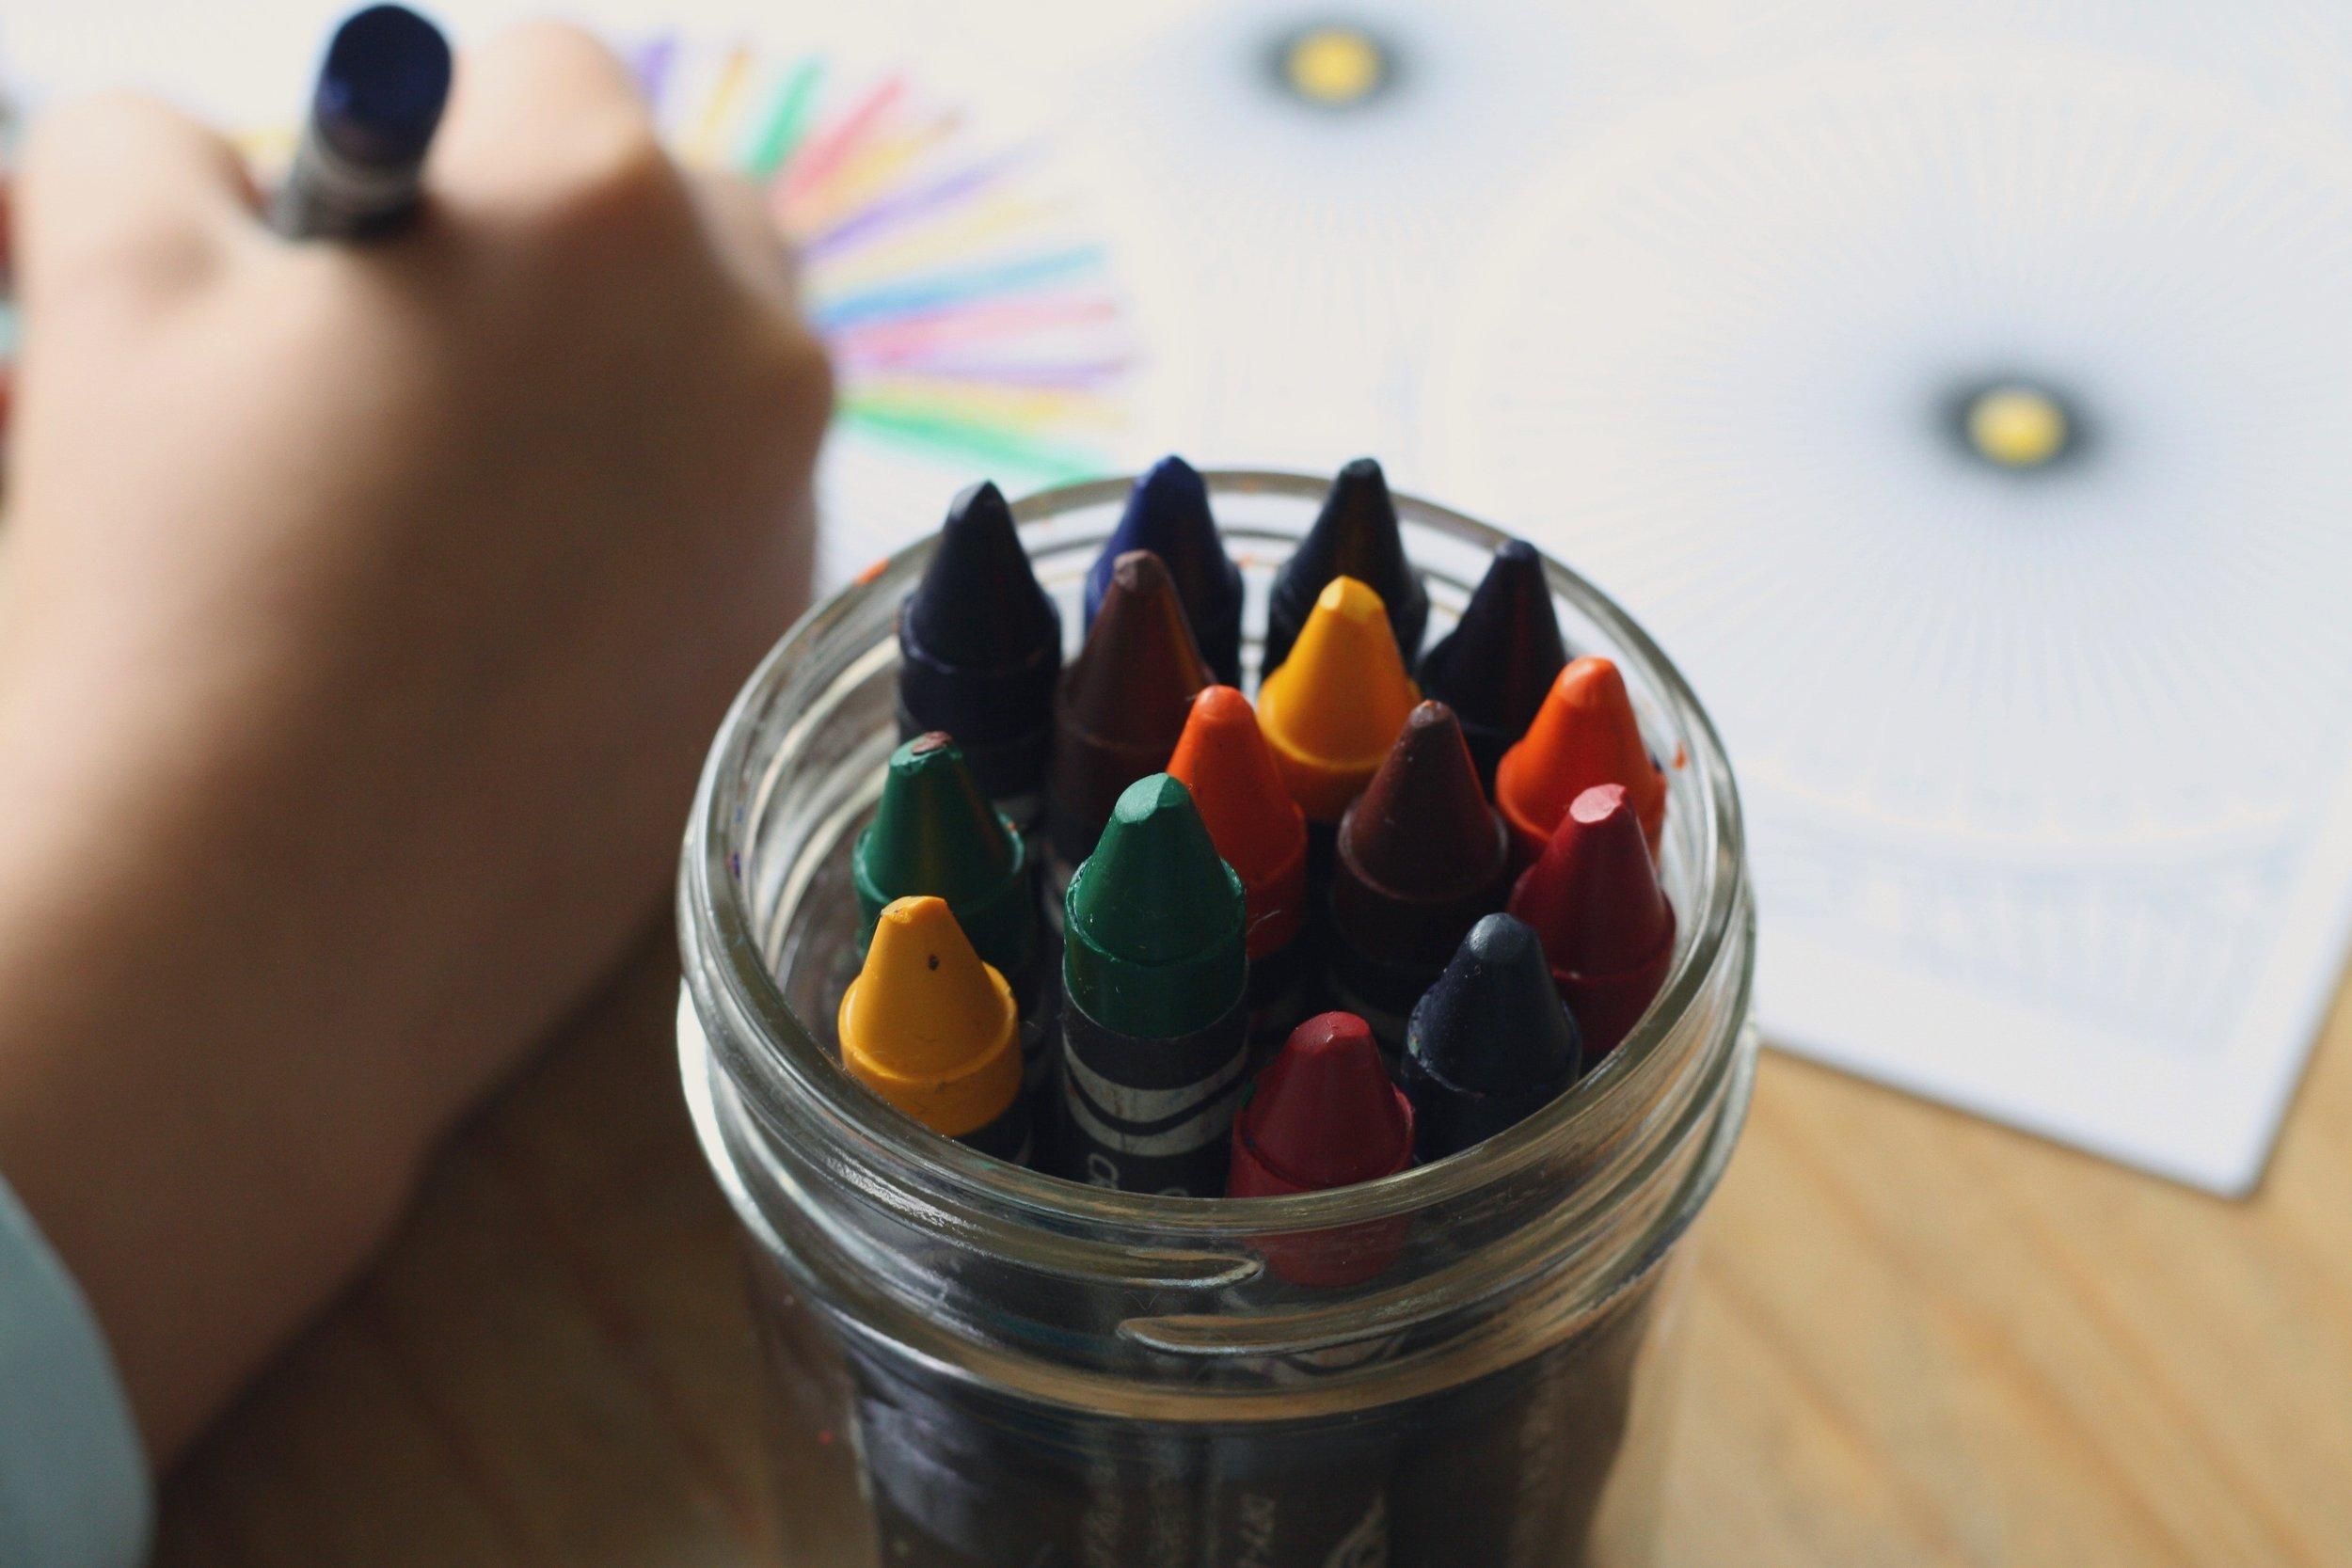 art-child-colorful-159570-pixels.jpg